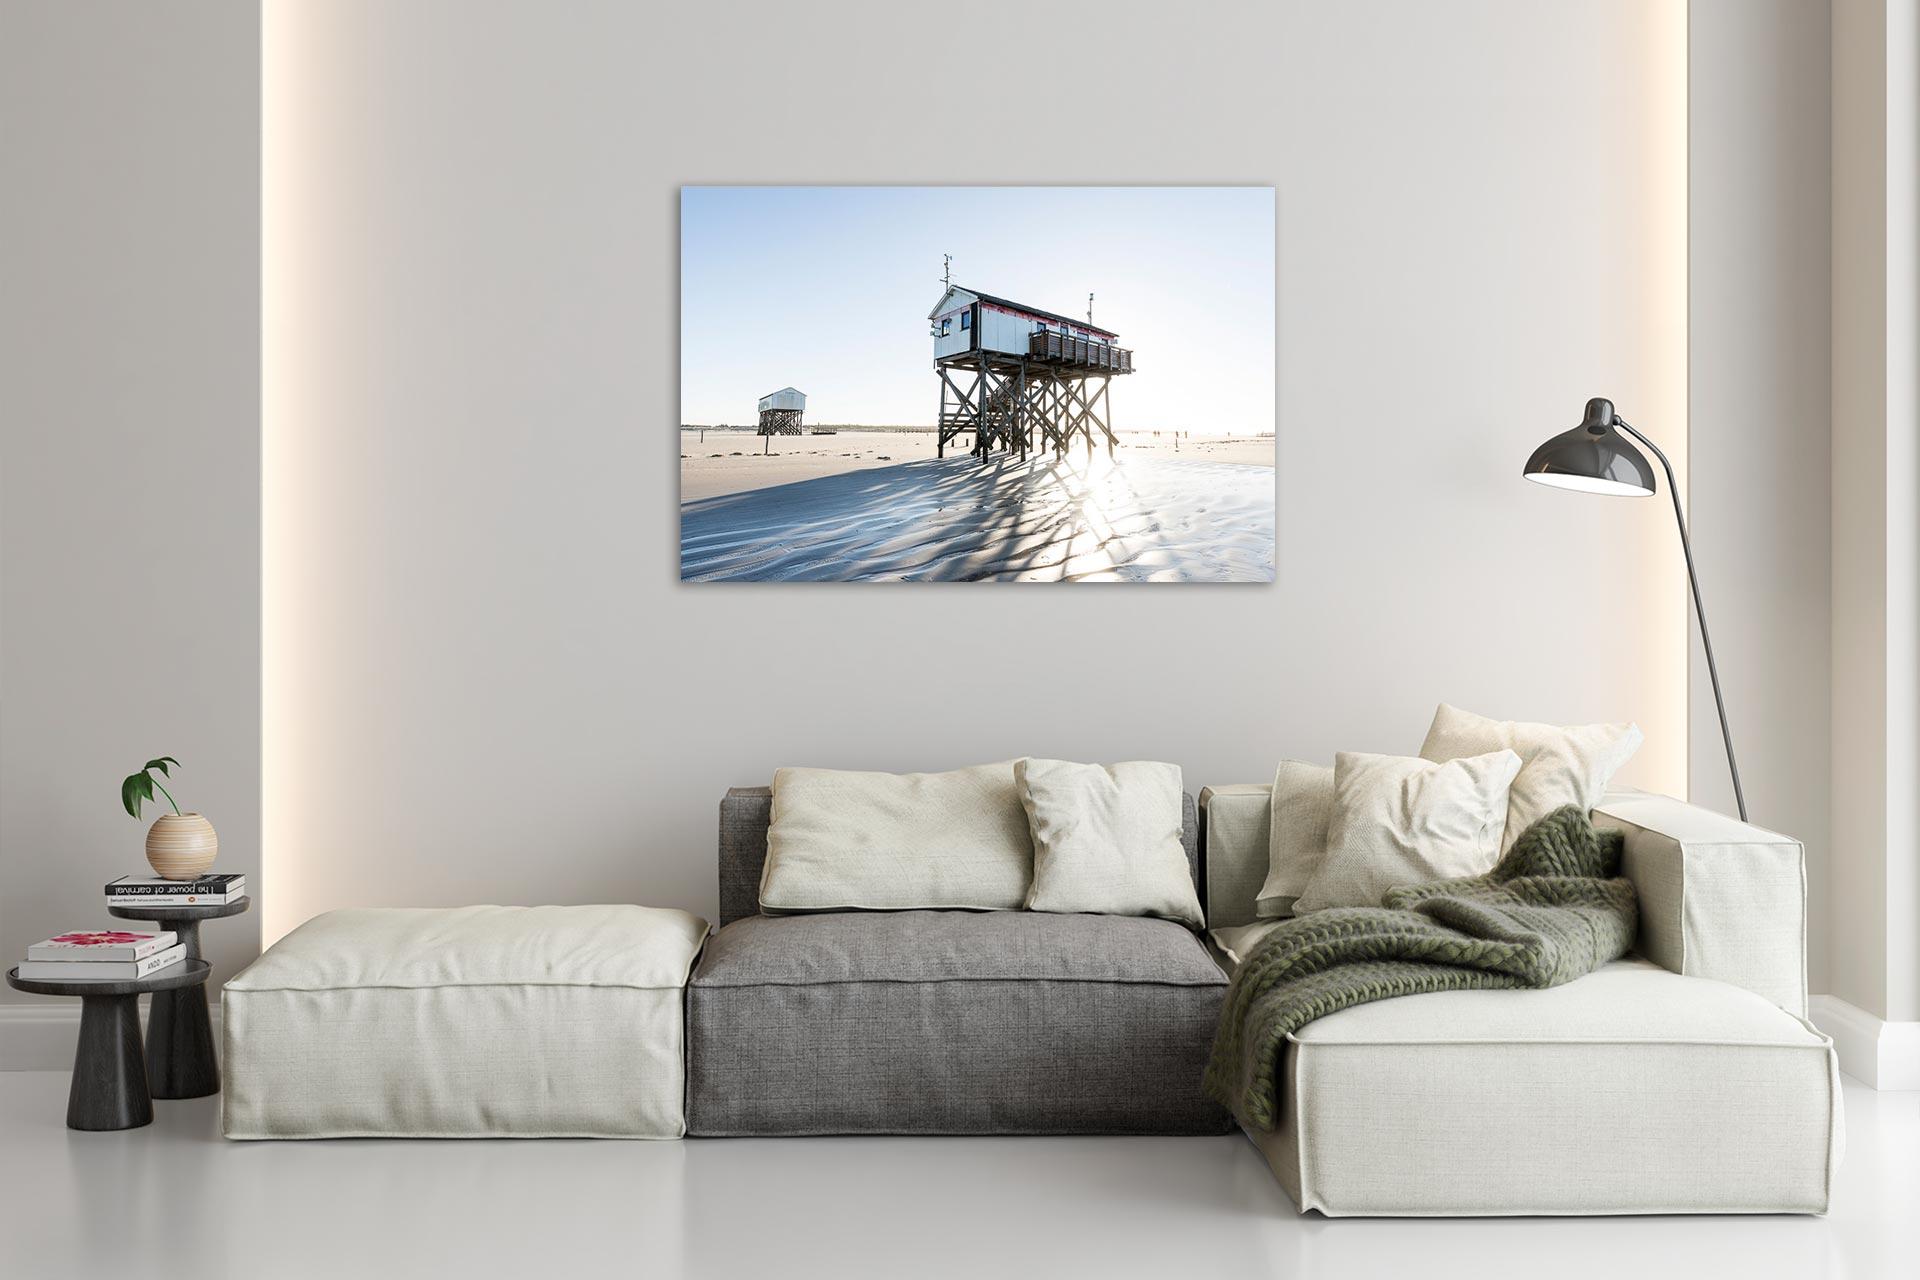 JS204-spo-4-wandbild-bild-auf-leinwand-acrylglas-aludibond-wohnzimmer